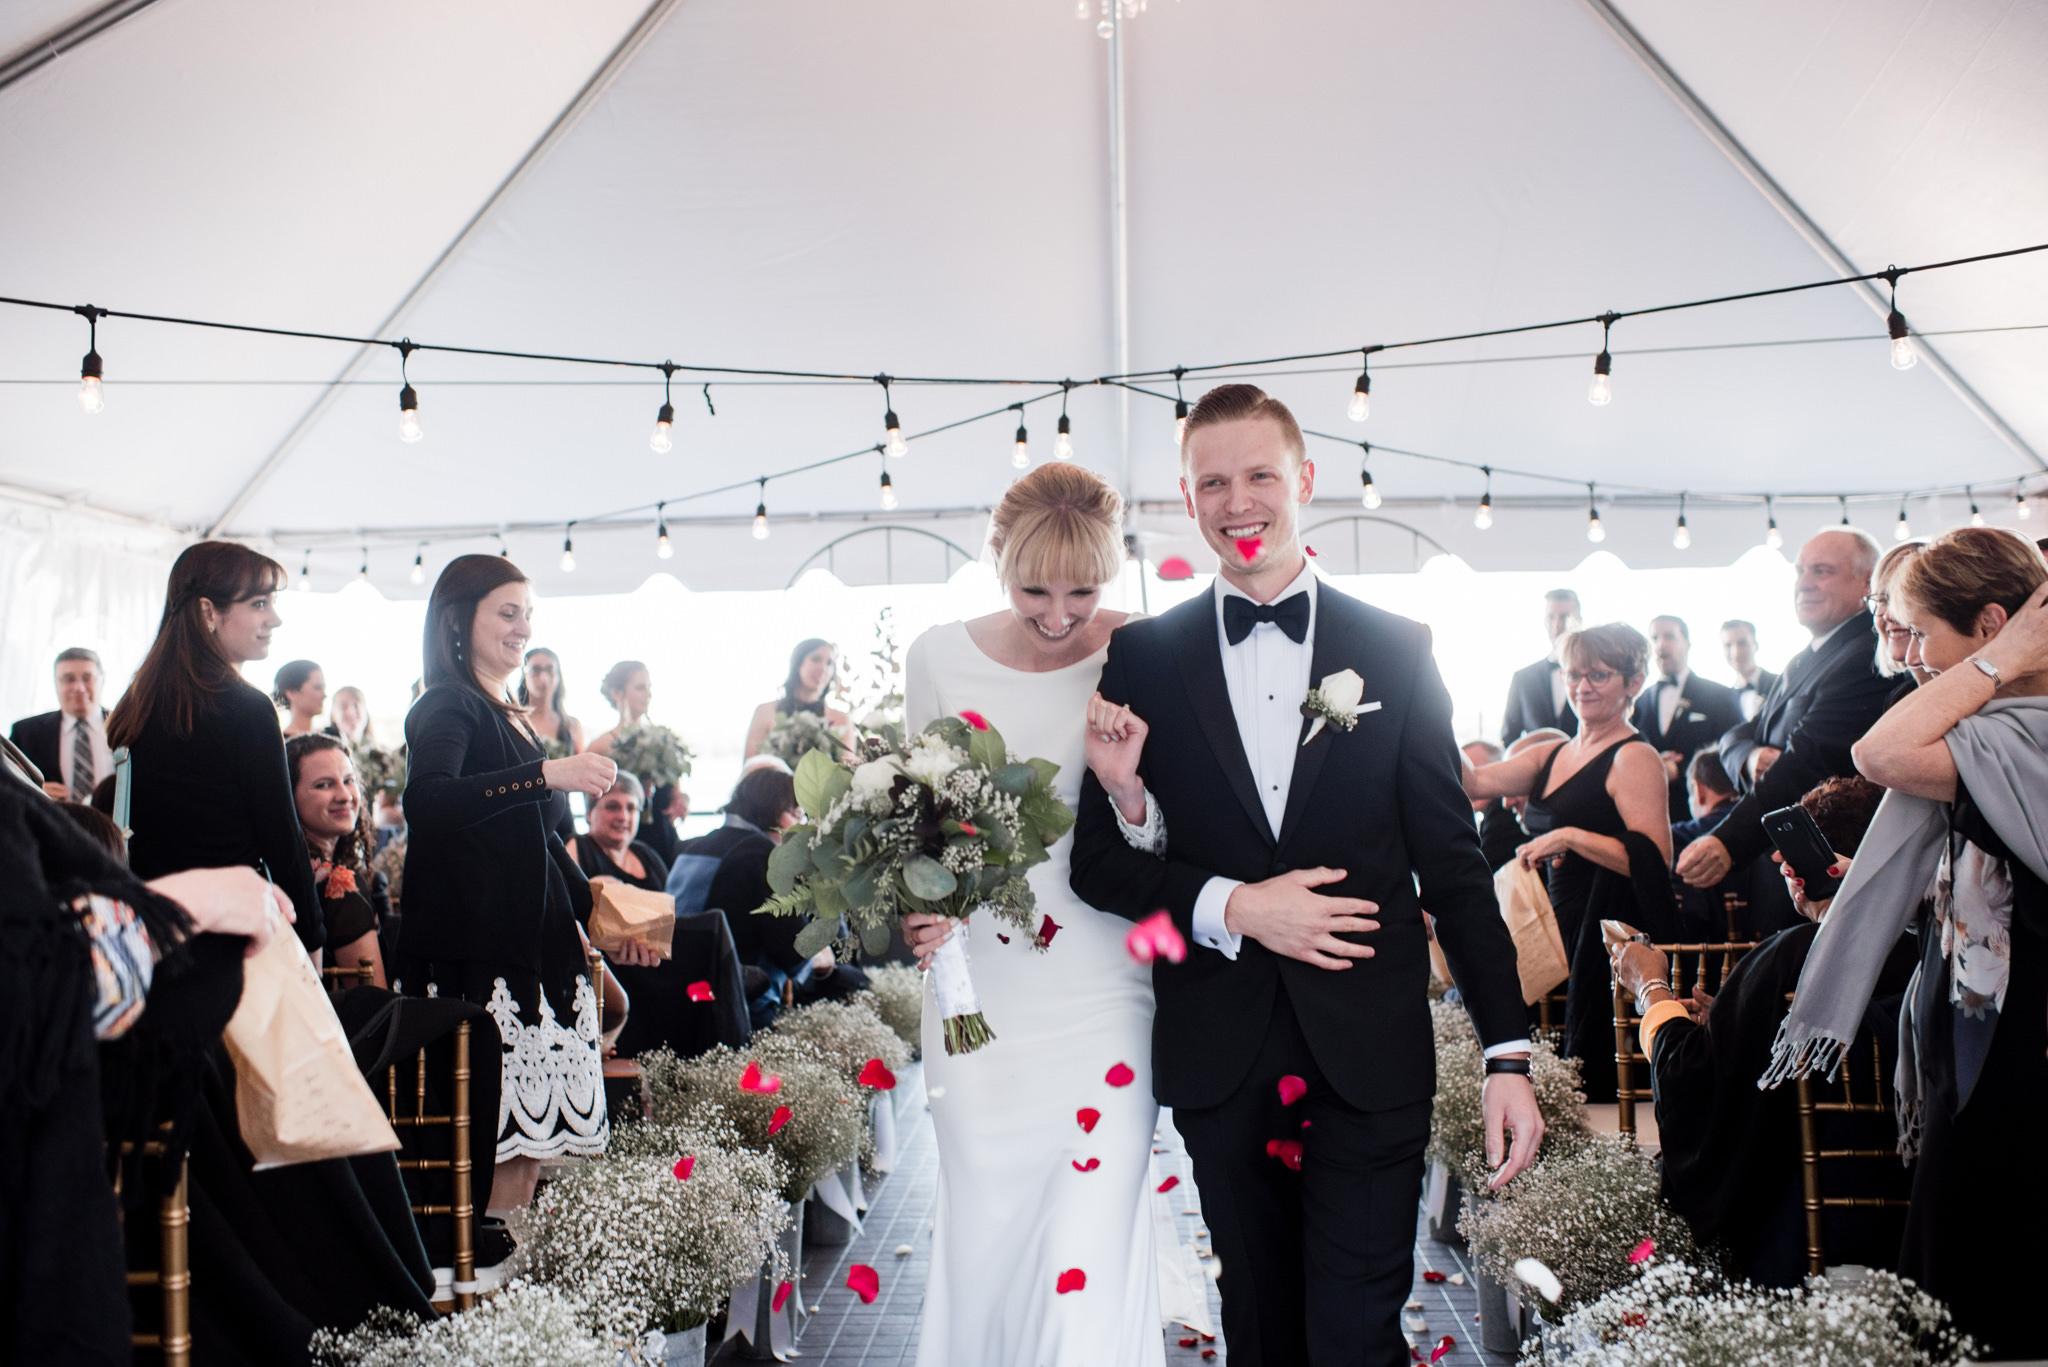 028-cottage-wedding-ceremony-toronto-photographer-lakeside.jpg